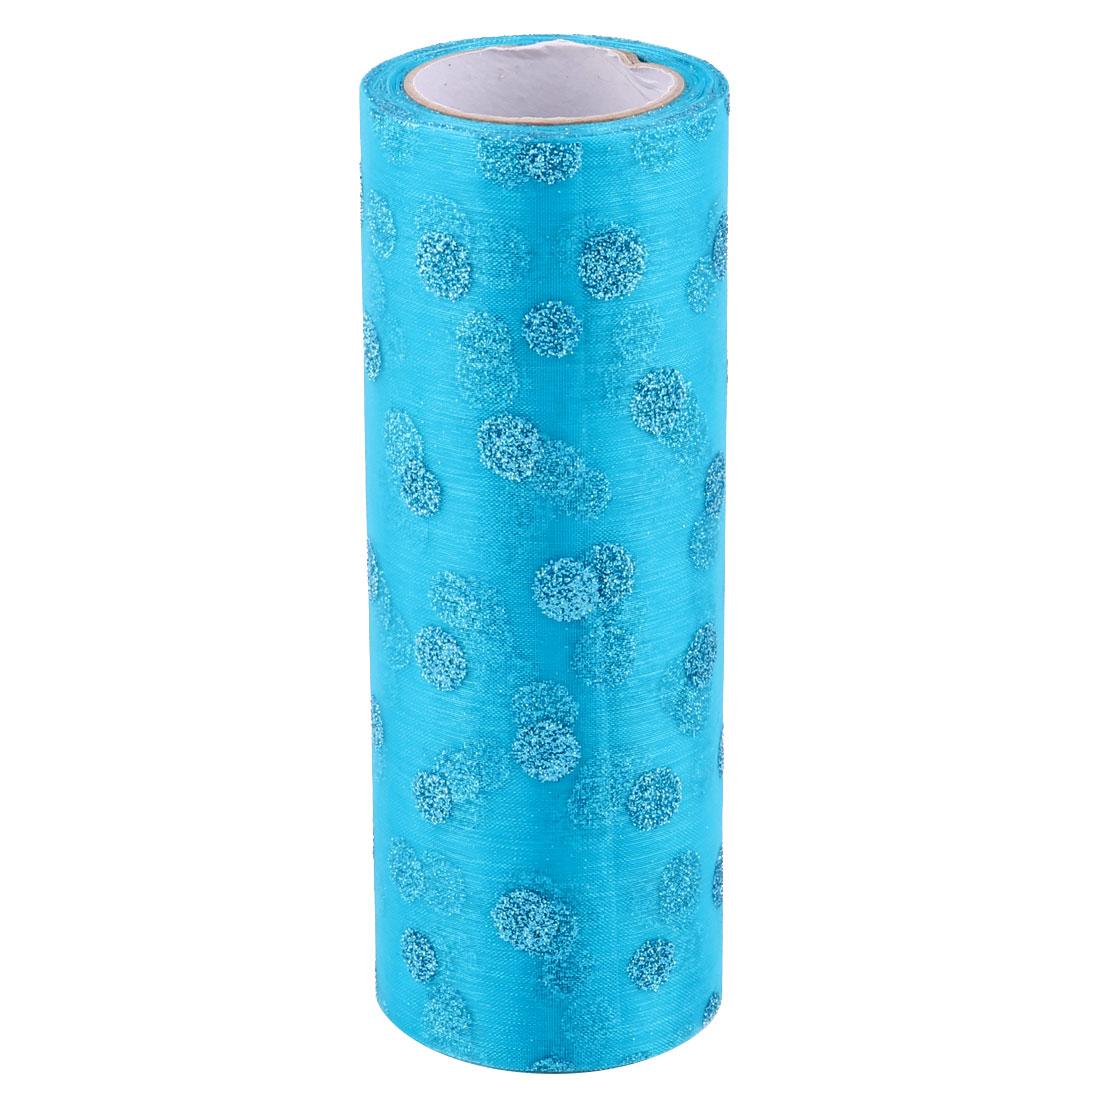 Home Wedding Nylon DIY Decoration Tulle Spool Roll Blue 6 Inch x 10 Yards